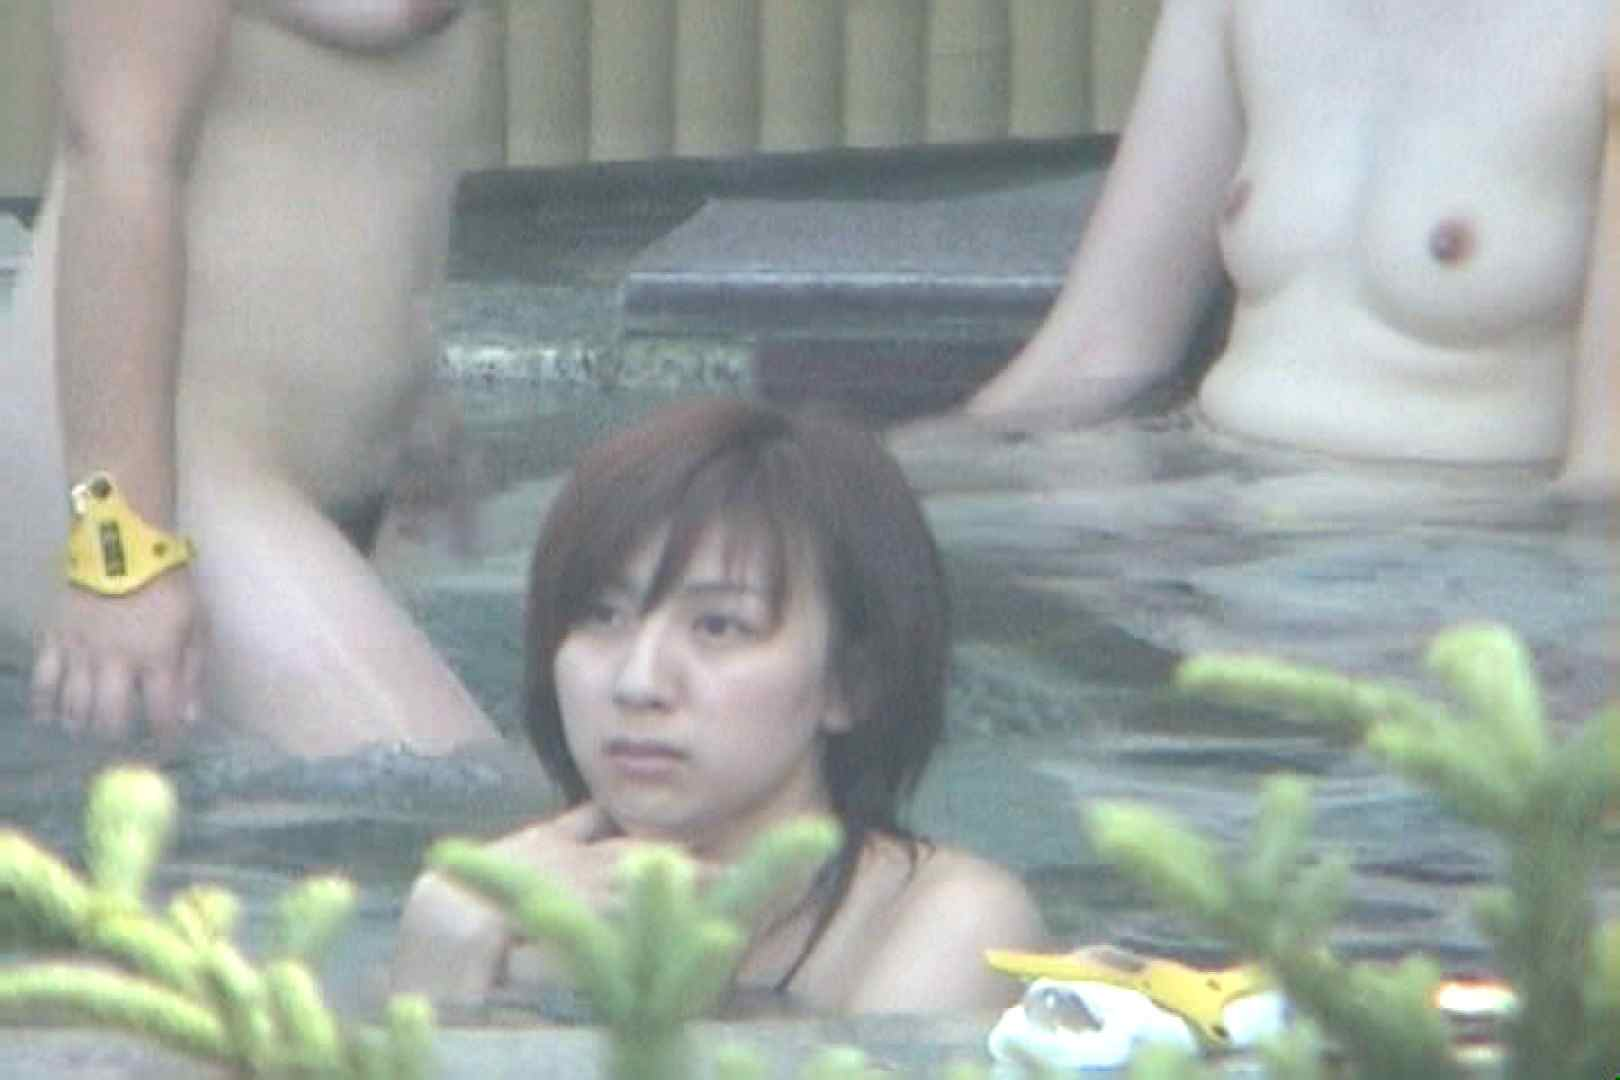 Aquaな露天風呂Vol.77【VIP限定】 盗撮   OLセックス  107画像 10